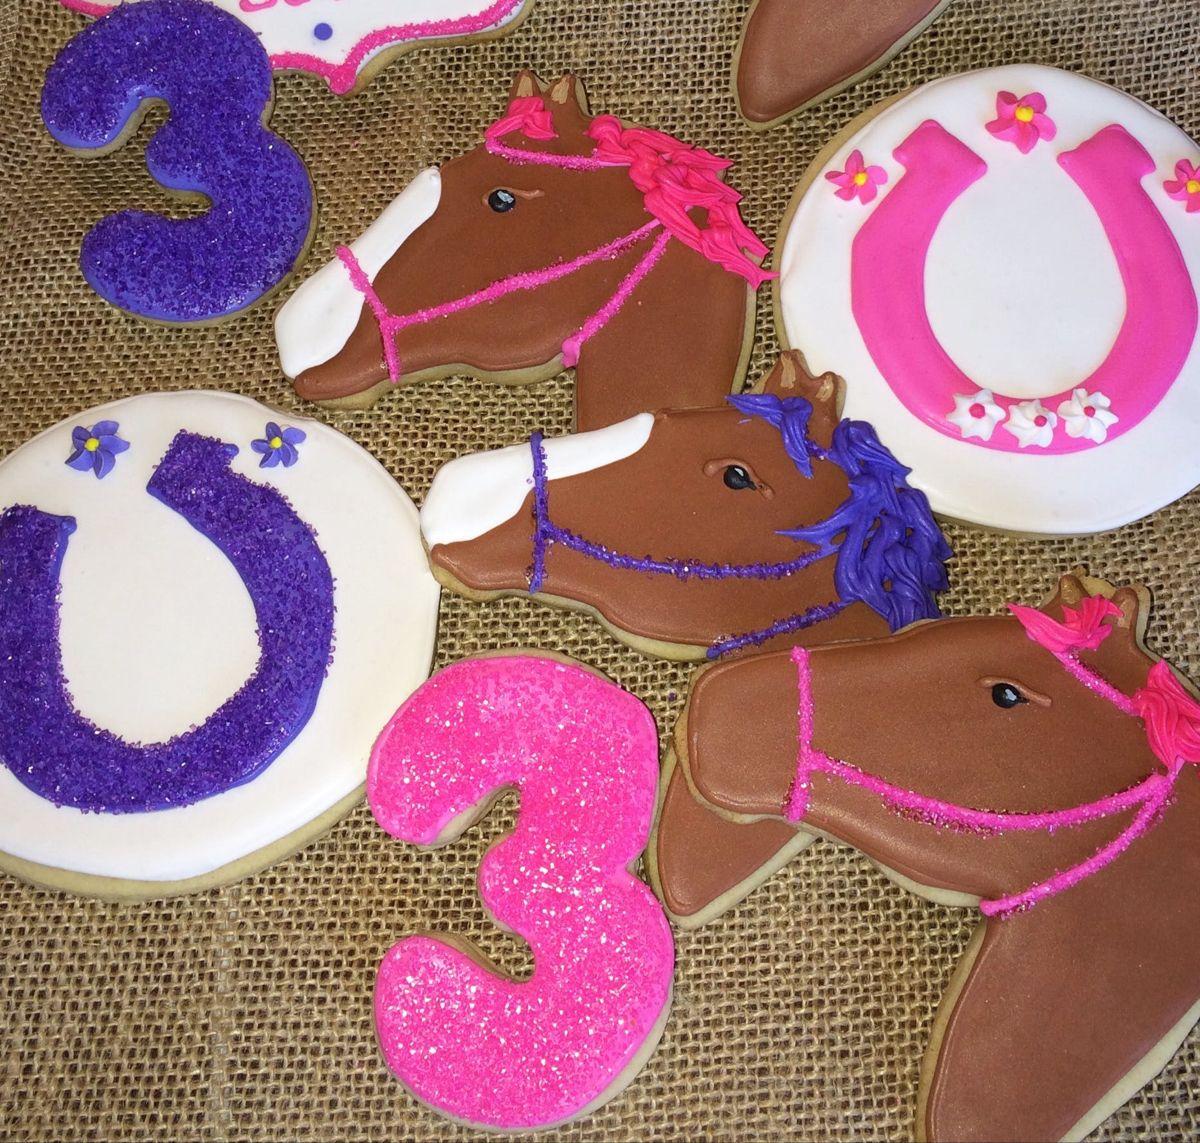 How to make marbled royal icing on sugar cookies. #easyroyalicingrecipe